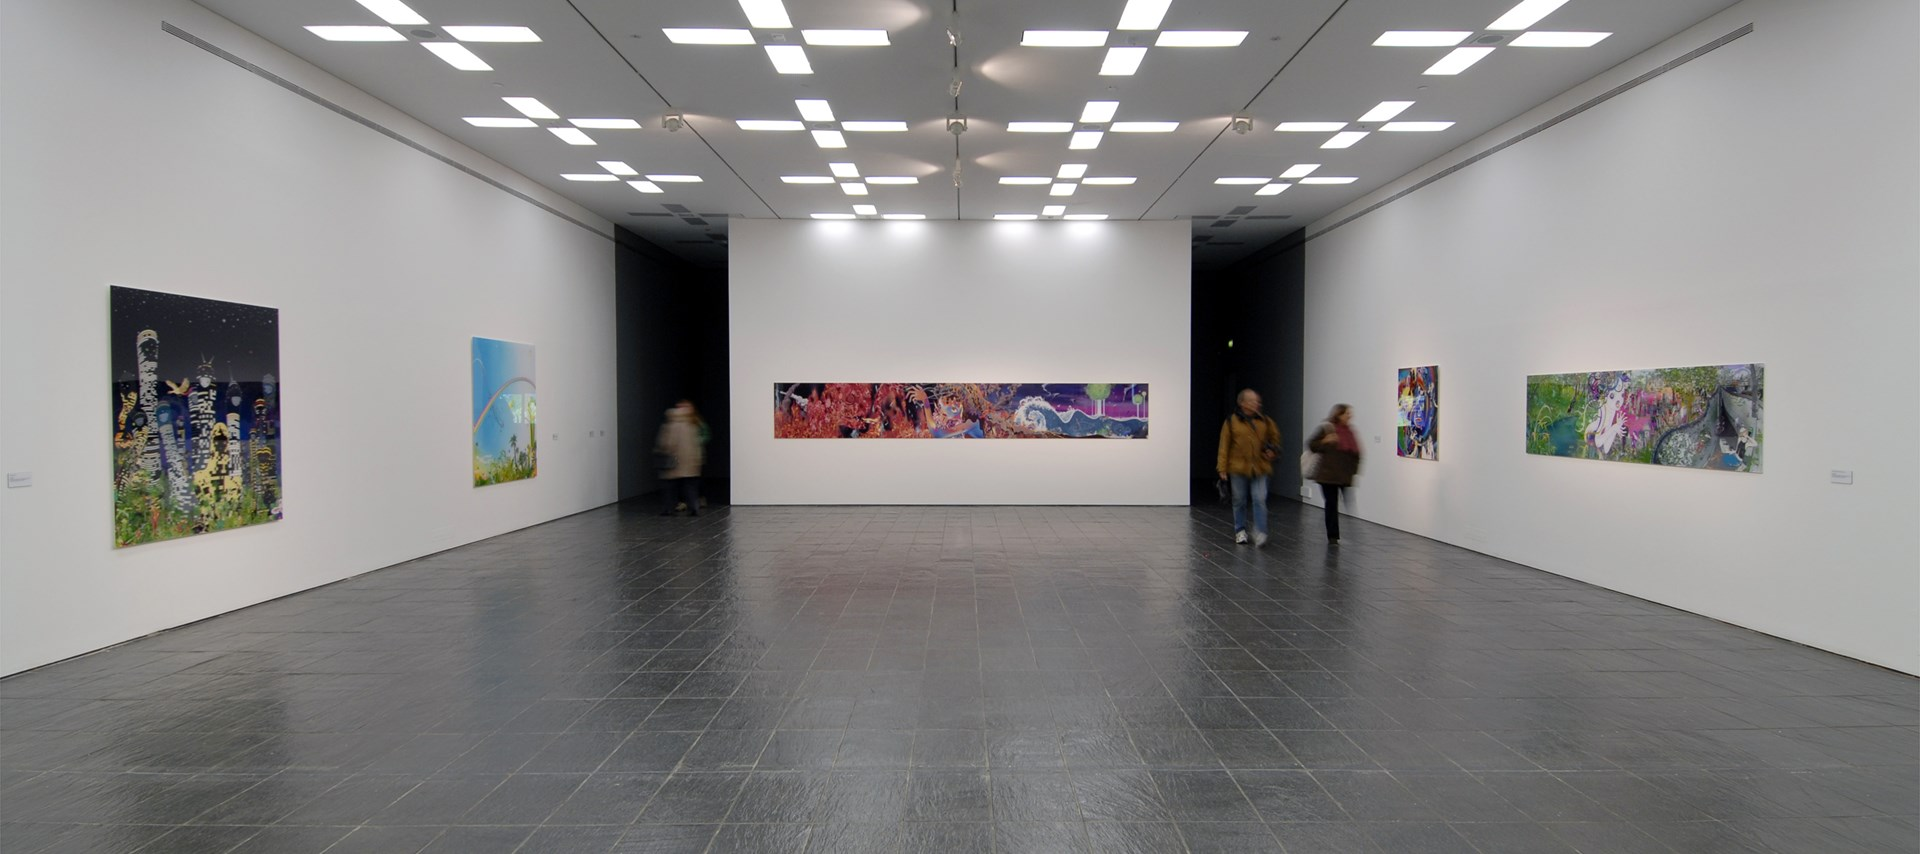 Chiho Aoshima: Installation Image by Colin Davison